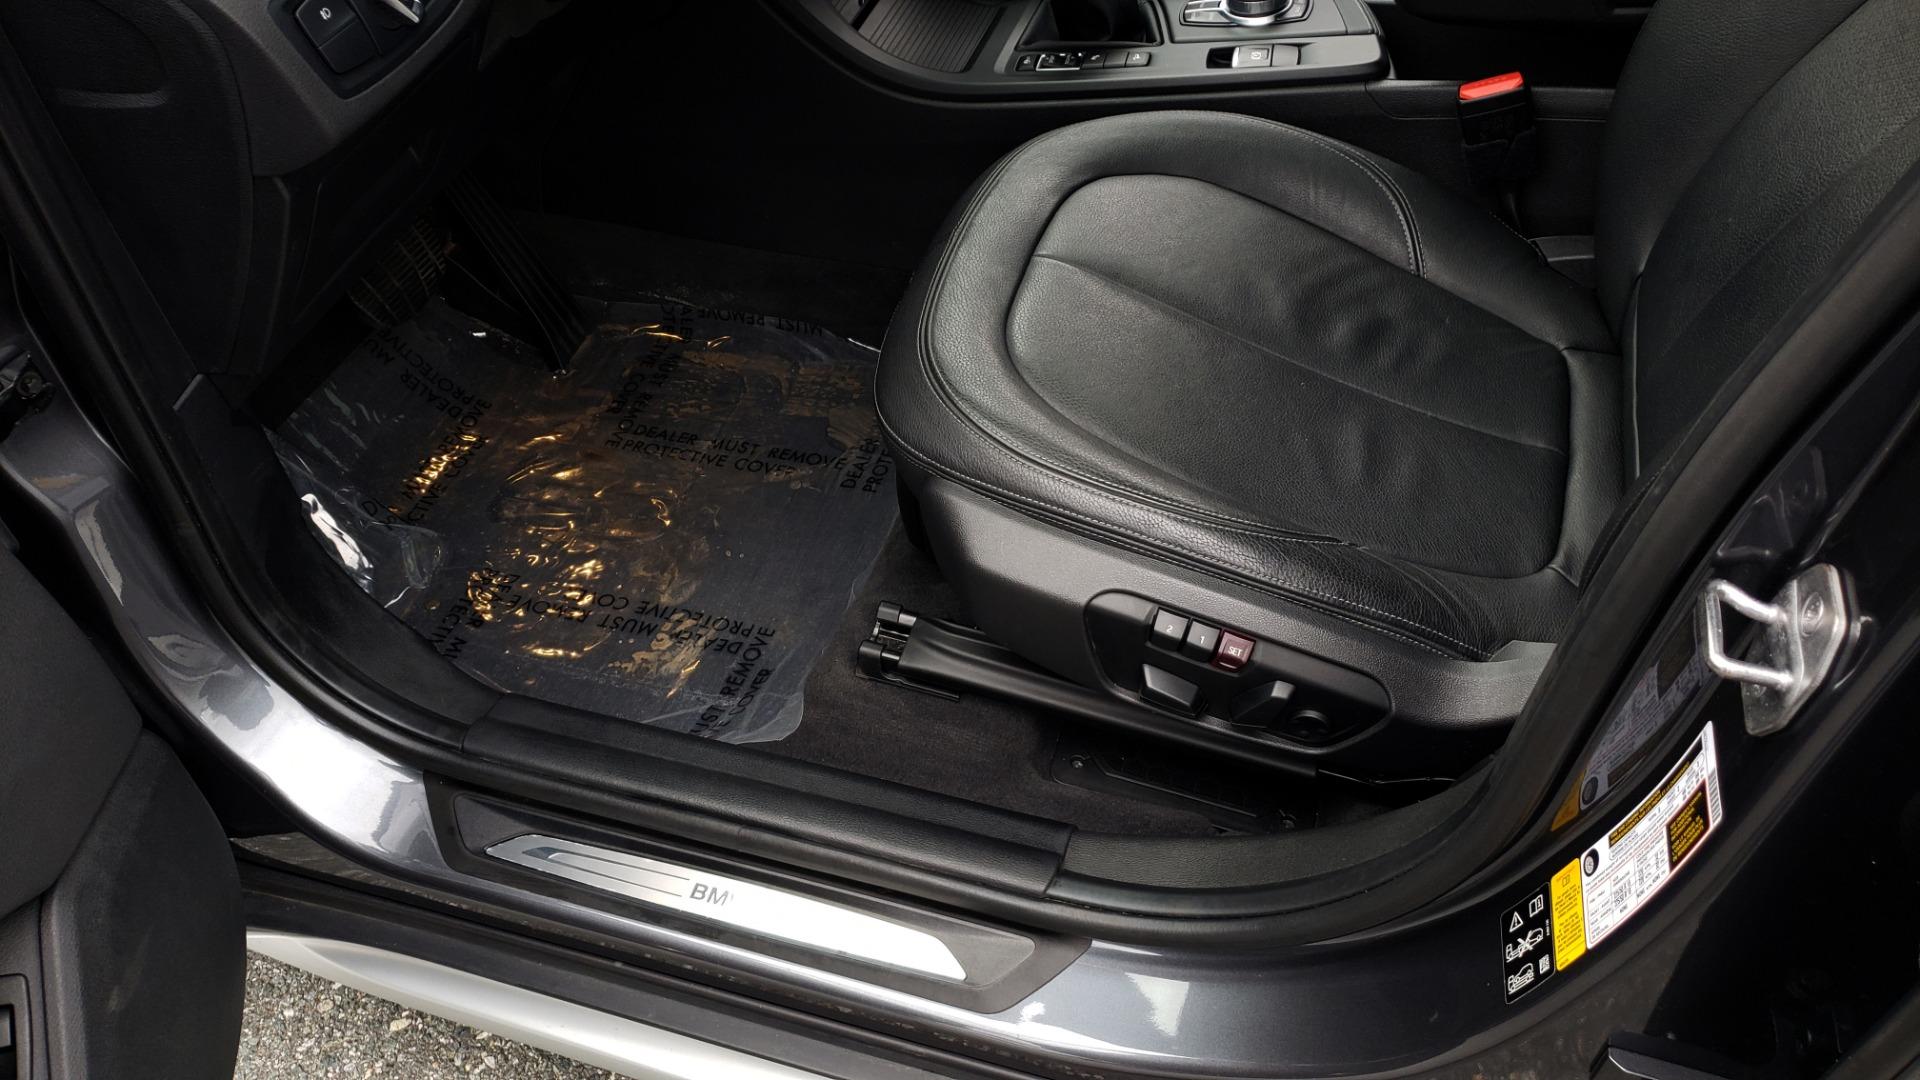 Used 2017 BMW X1 XDRIVE28I / PREM PKG / DRIVER ASST / NAV / CLD WTHR for sale Sold at Formula Imports in Charlotte NC 28227 35